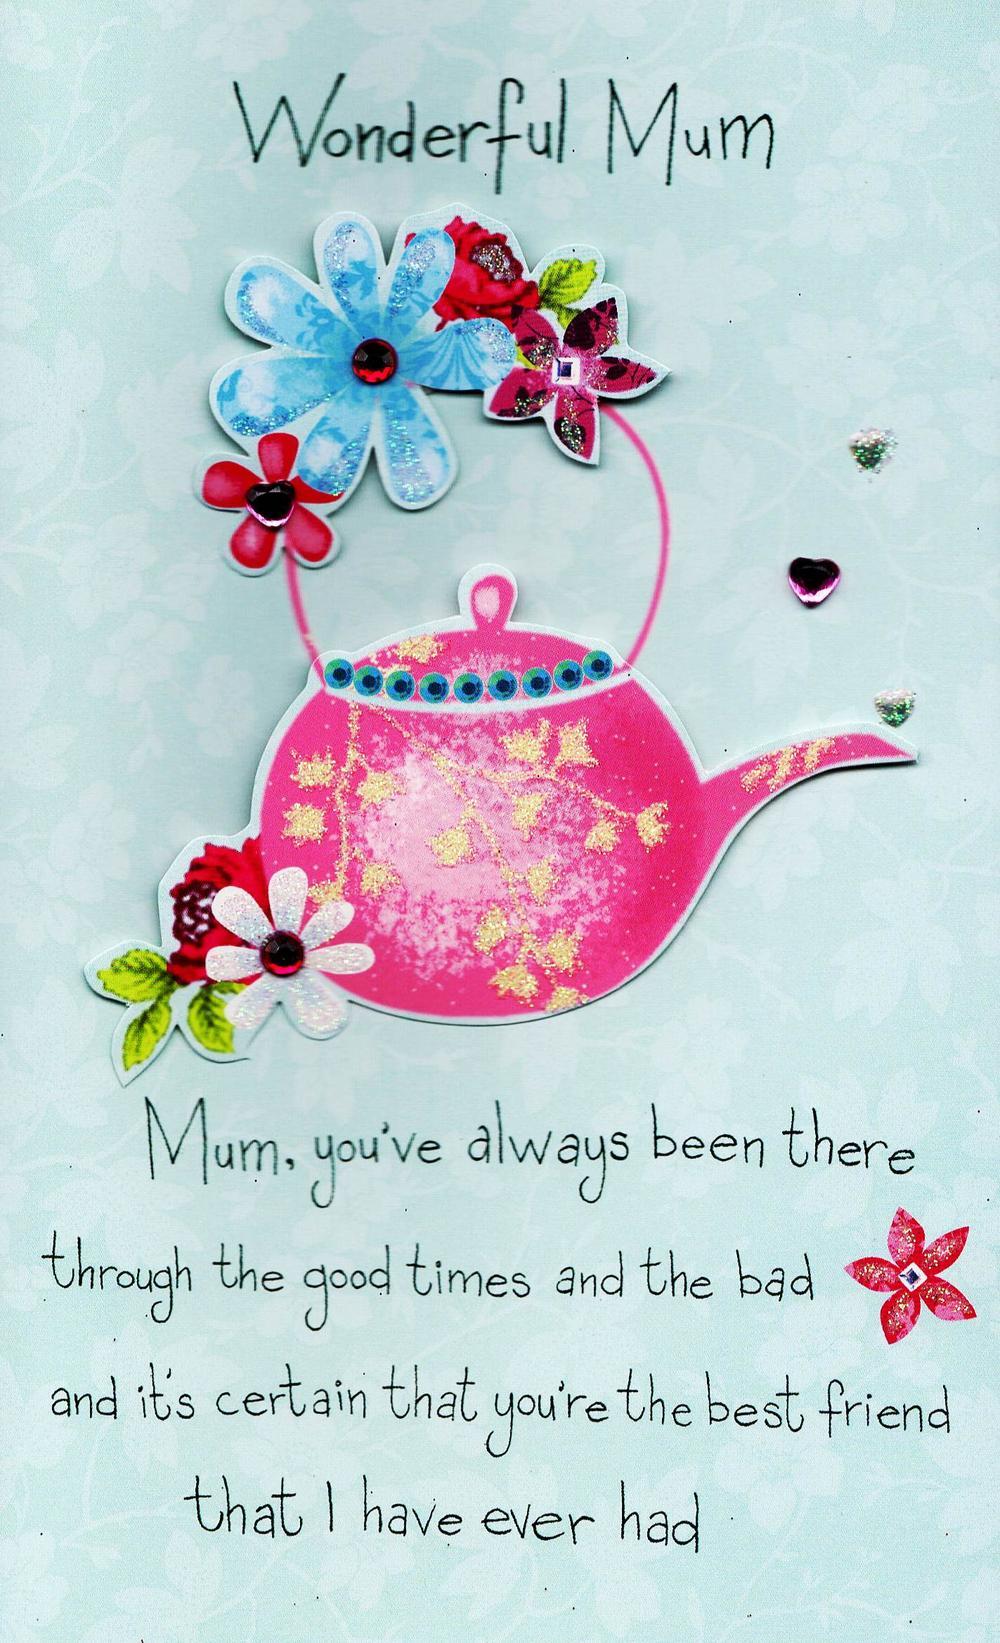 Luxury Wonderful Mum Hand-Finished Mother's Day Card